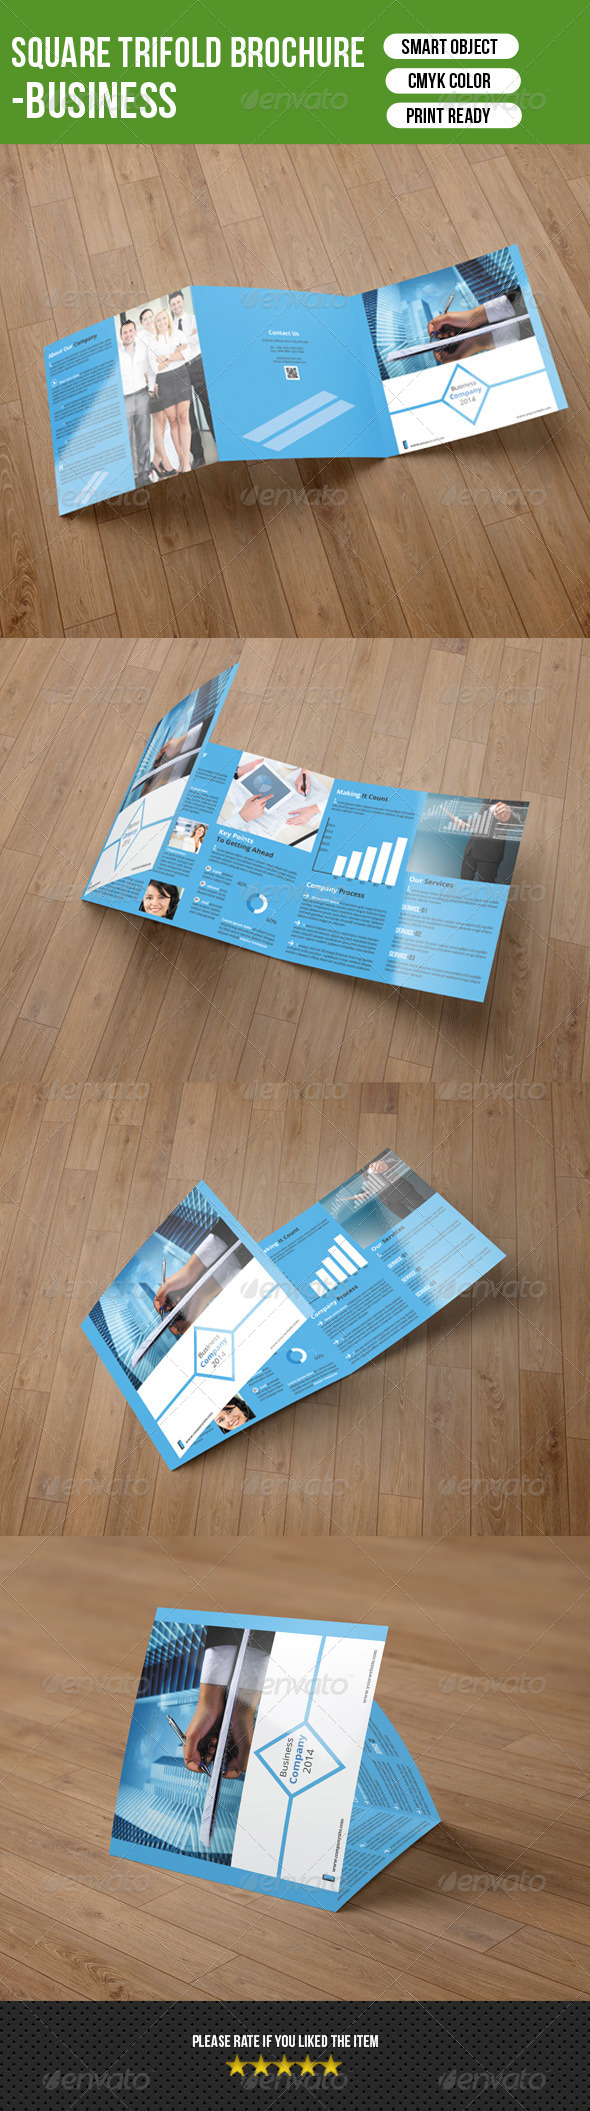 GraphicRiver Square Trifold Brochure-Business Vol-4 7693683